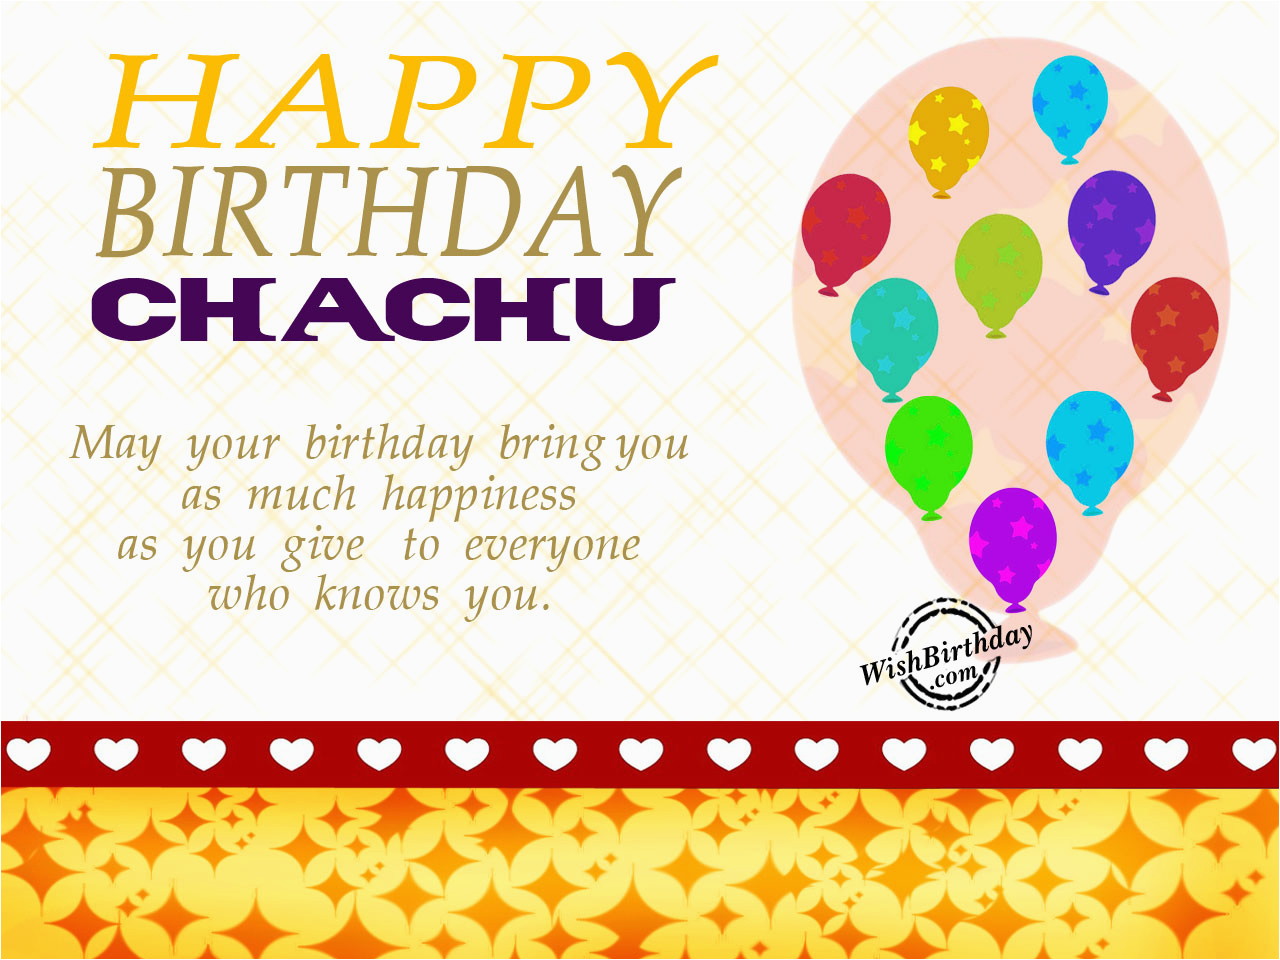 birthday wishes for chachu chacha ji